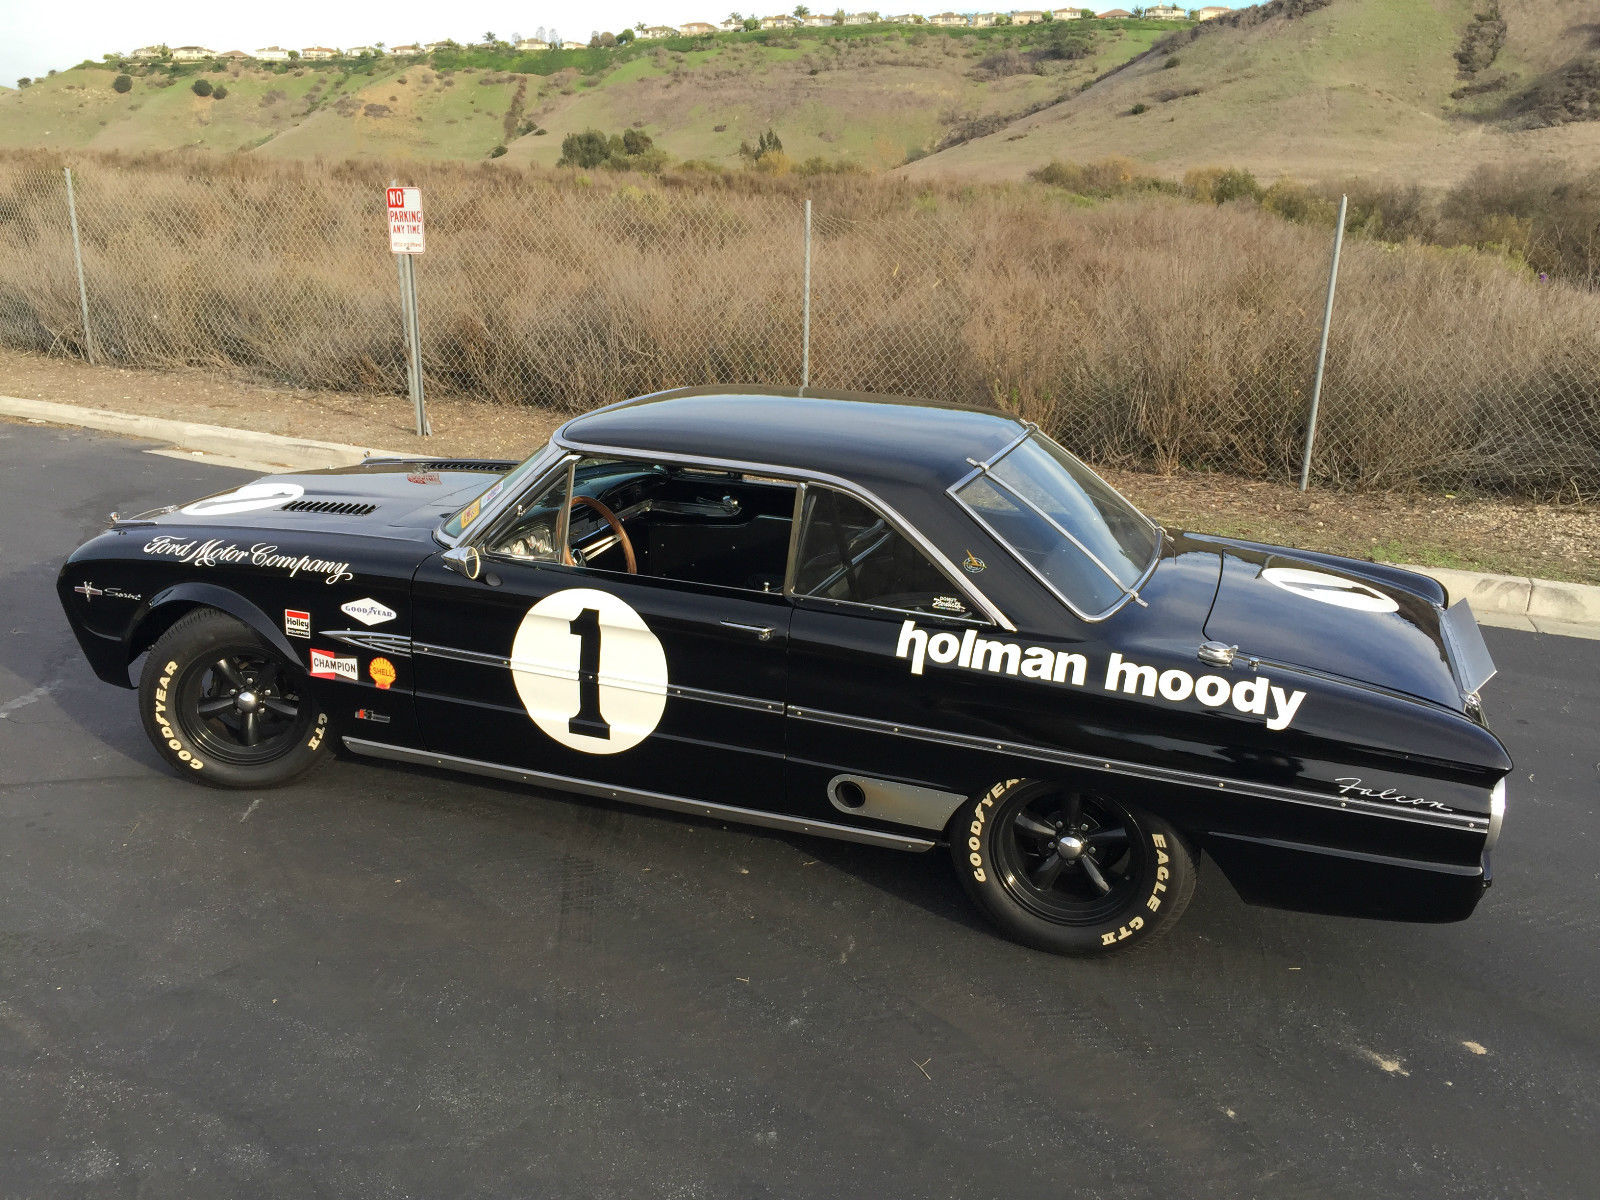 1963 1/2 Ford Falcon V8 Sprint - Vintage Era Correct Trans ...